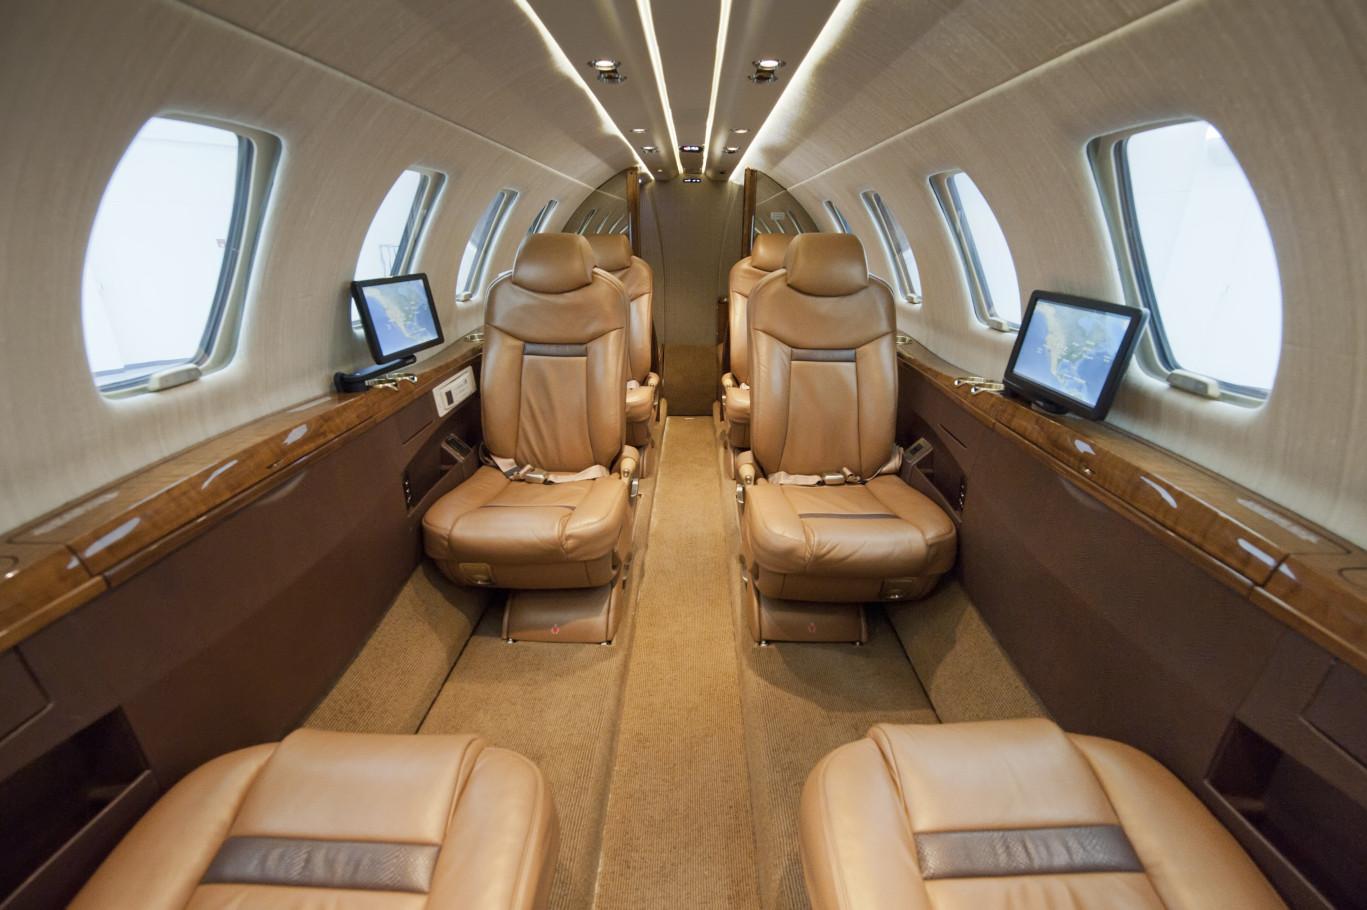 Citation_CJ4_DARK_TAN_Light-Jet_Legacy_Aviation_Private_Jet_NetJets_Jet_Charter_TEB_VNY_MIA_PBI_FRG_SFO_FLL_FXE_BED.jpg